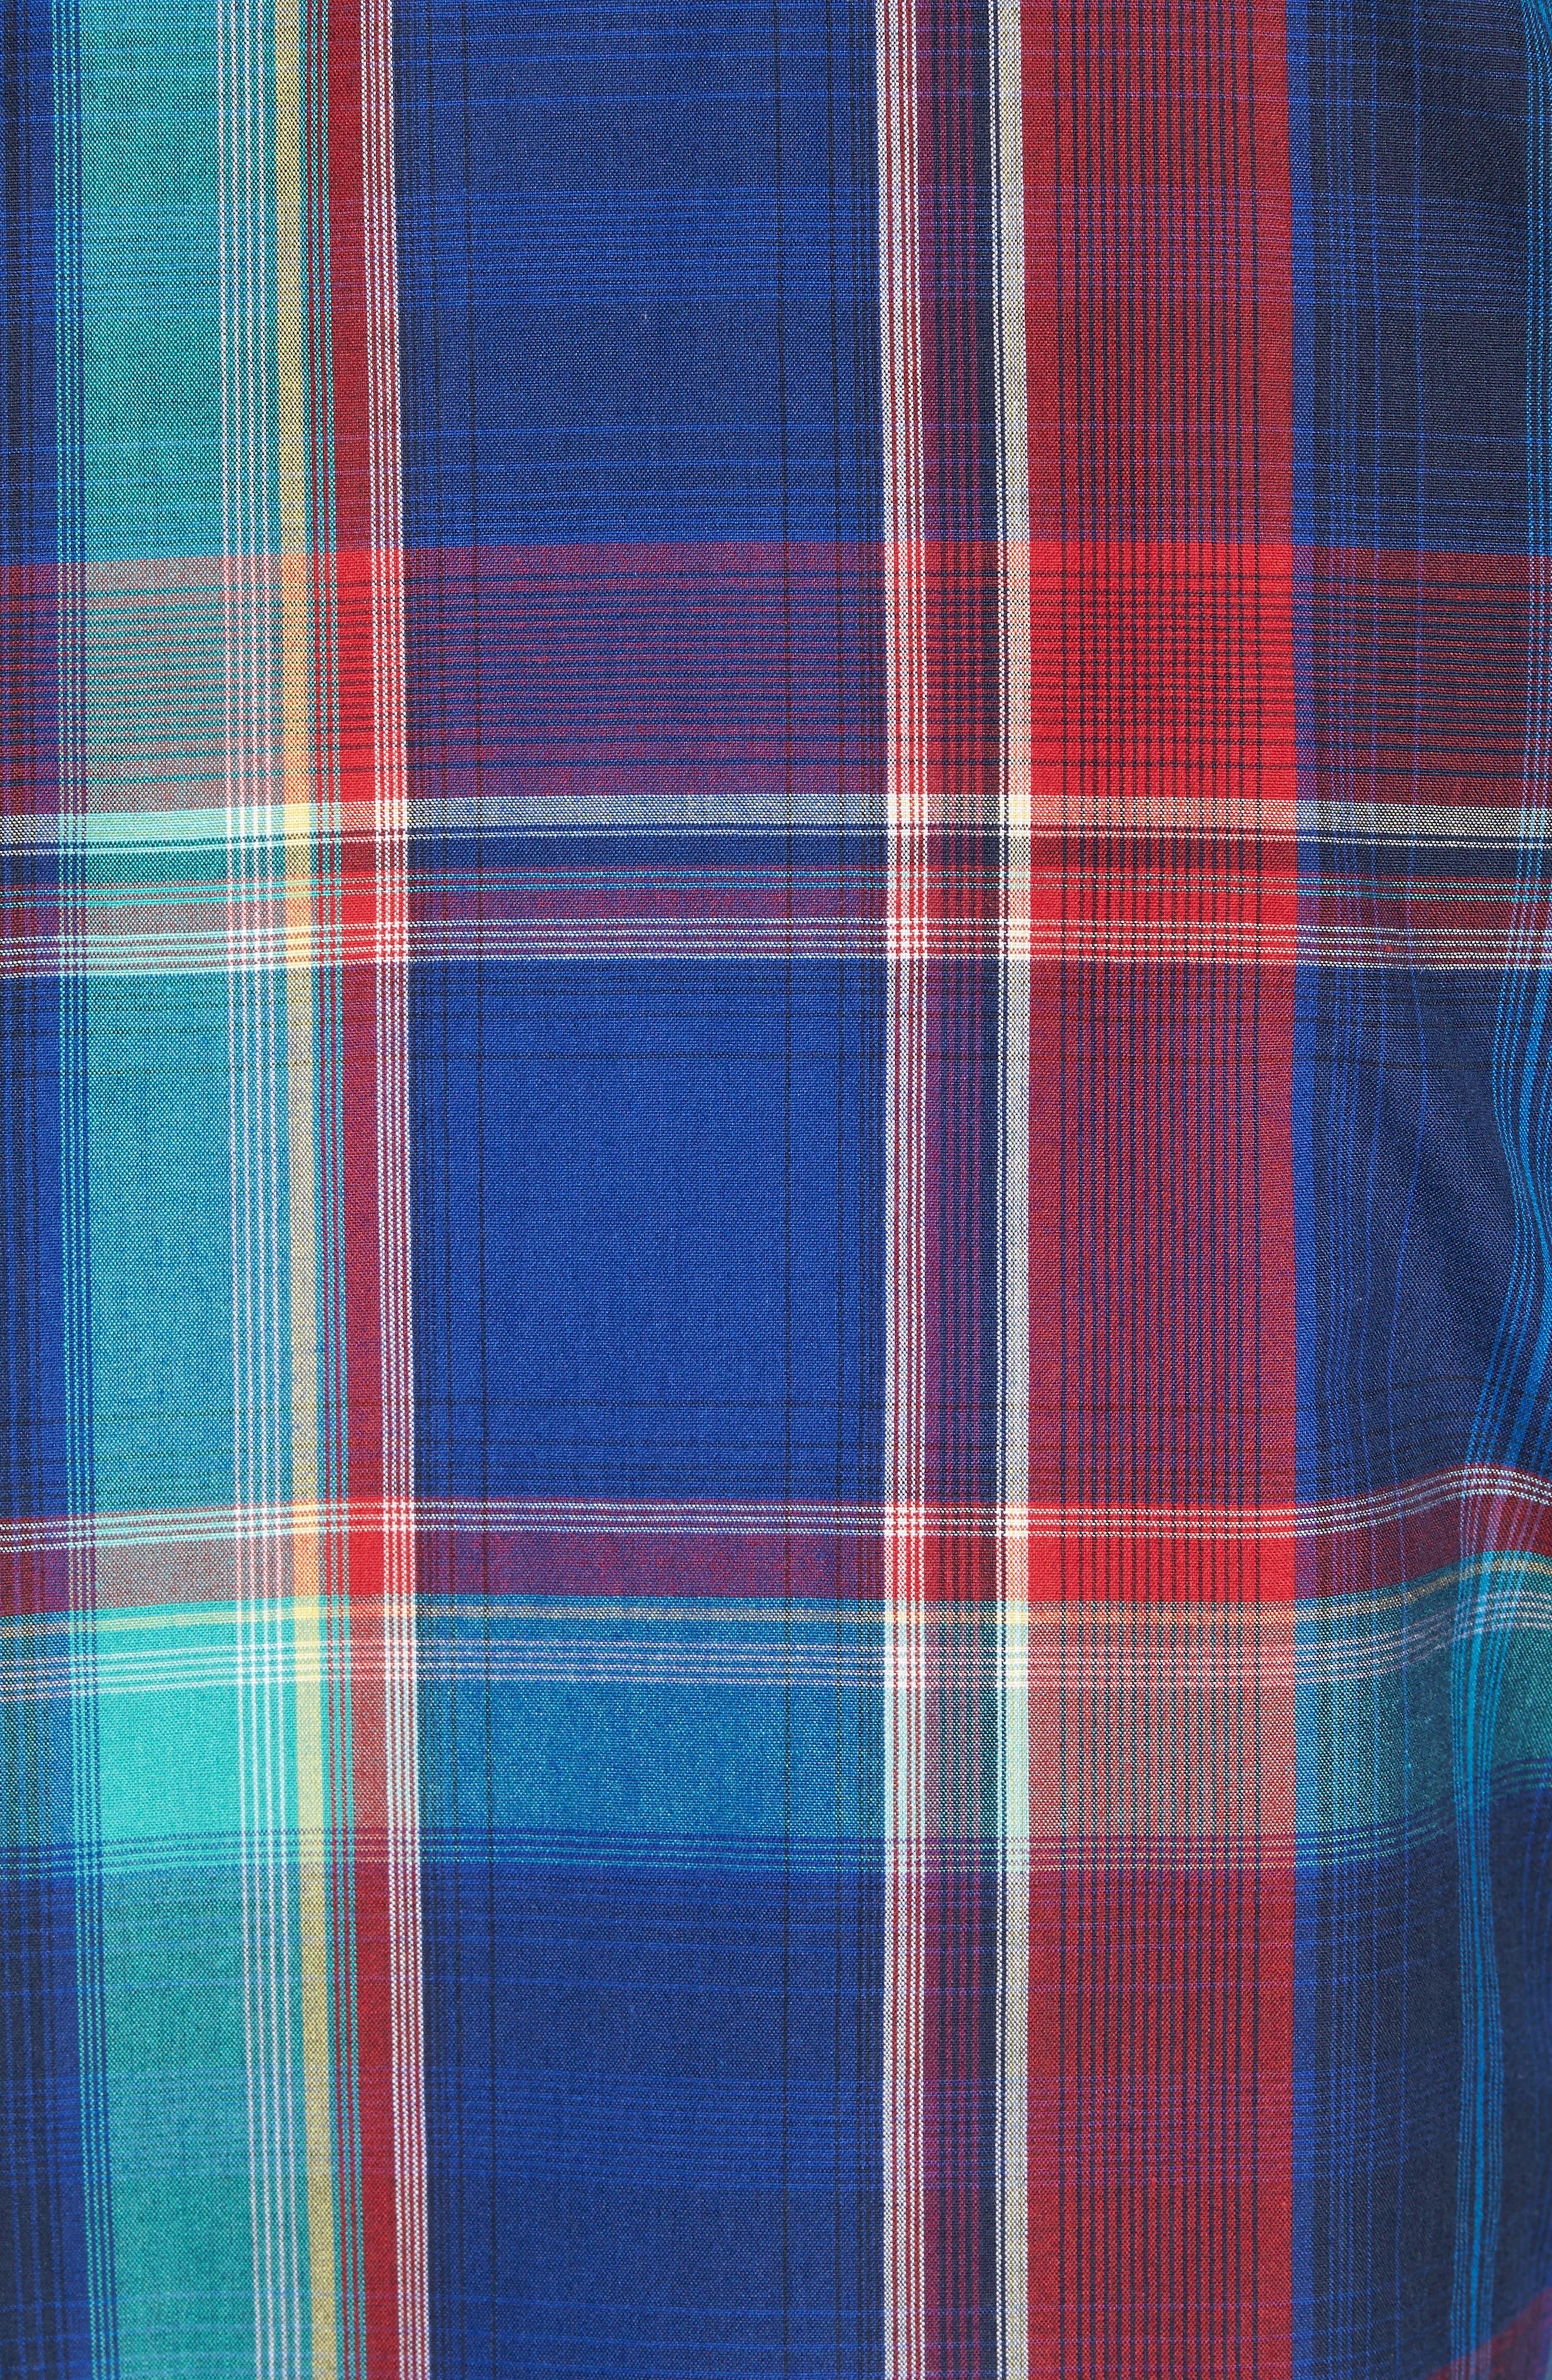 Ivy Trim Fit Madras Plaid Sport Shirt,                             Alternate thumbnail 5, color,                             Navy Red Fine Line Plaid